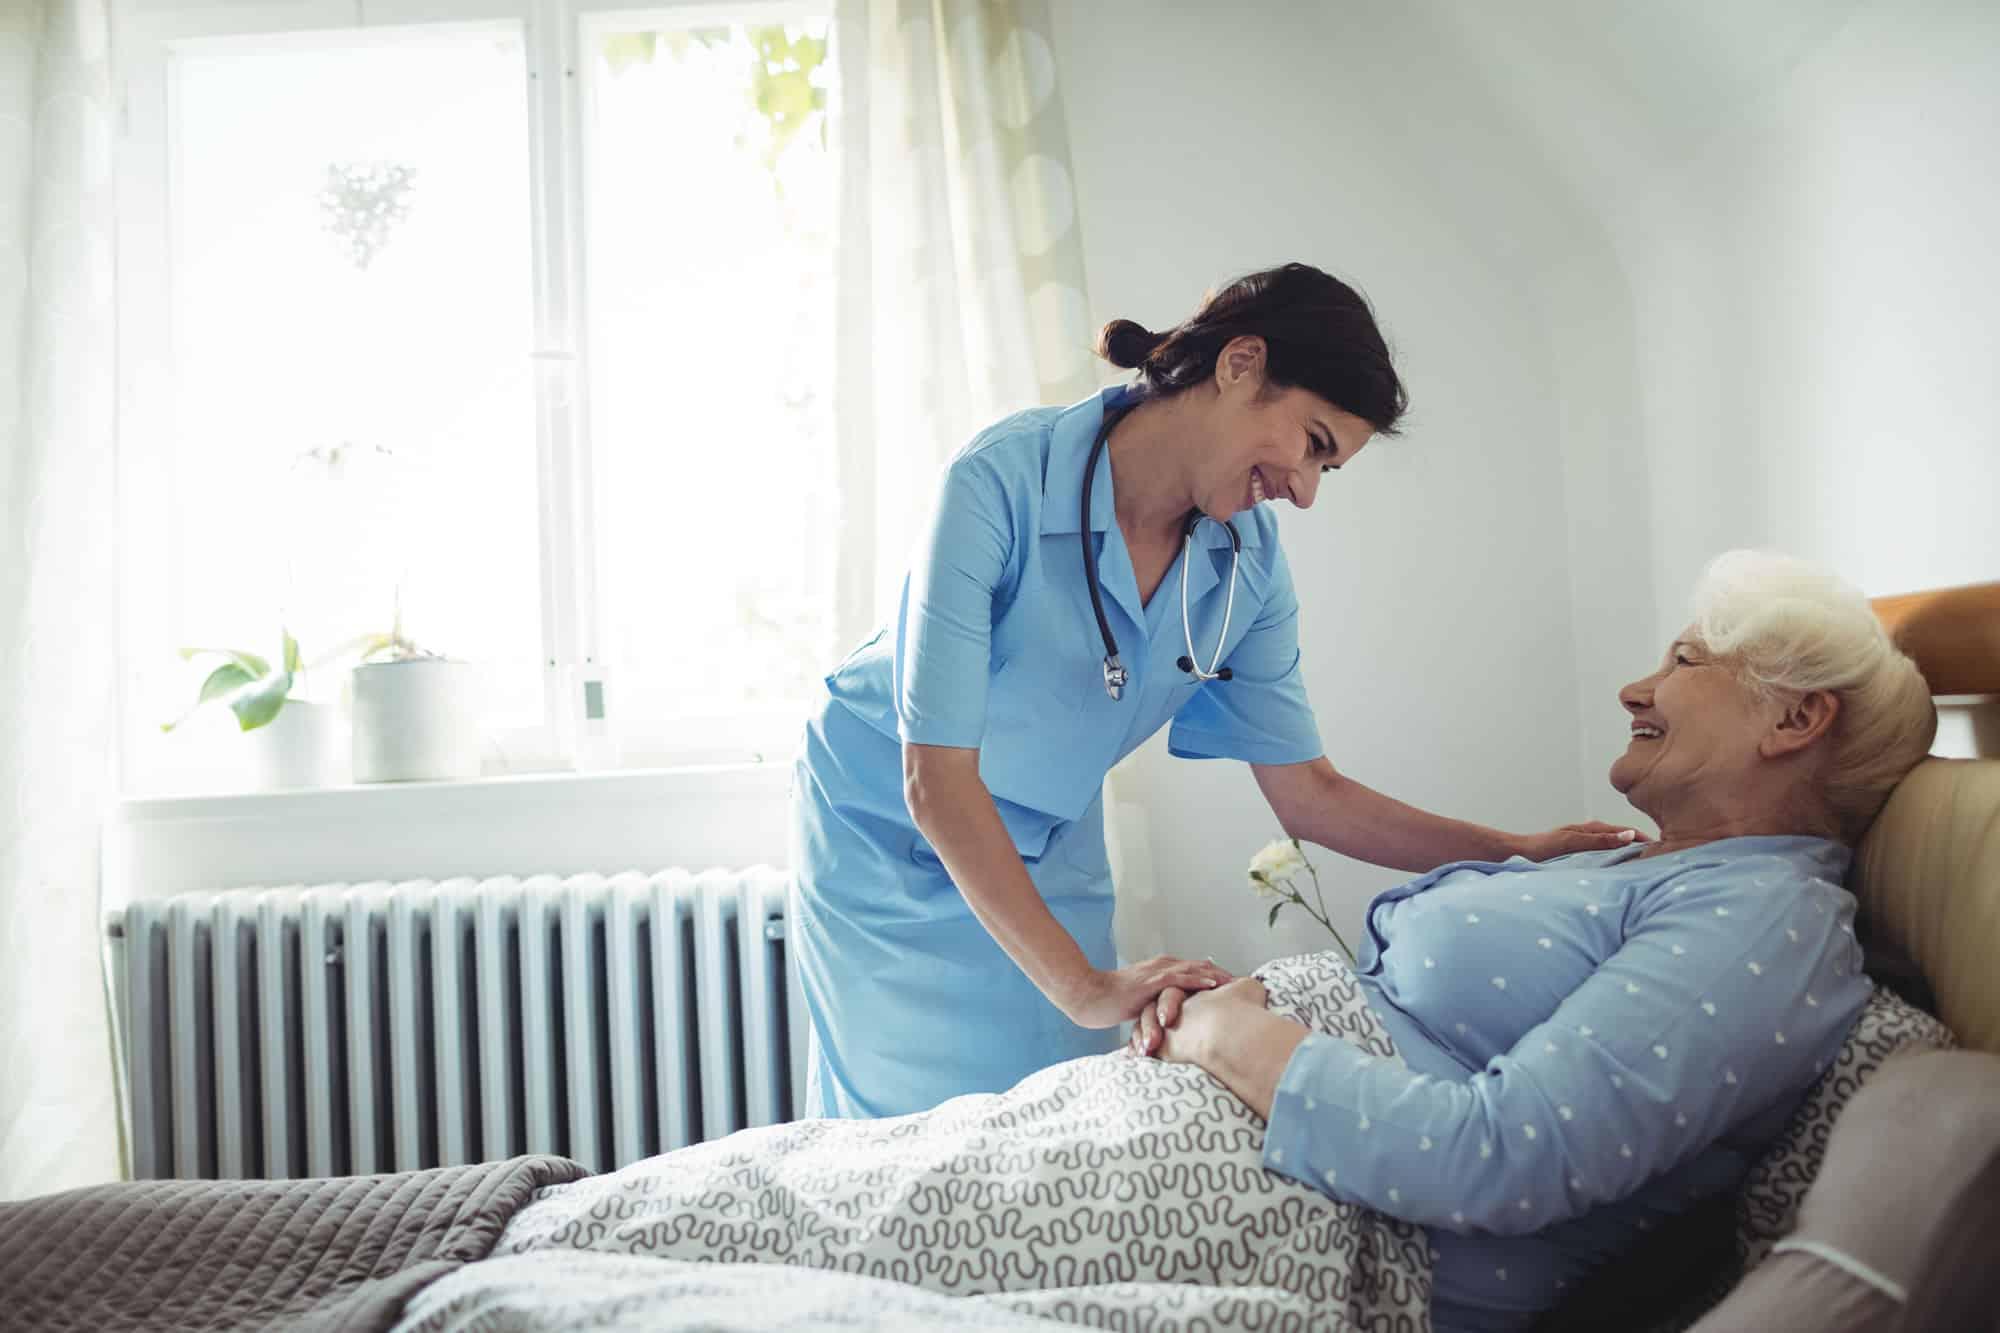 nurse providing care to bedridden patient